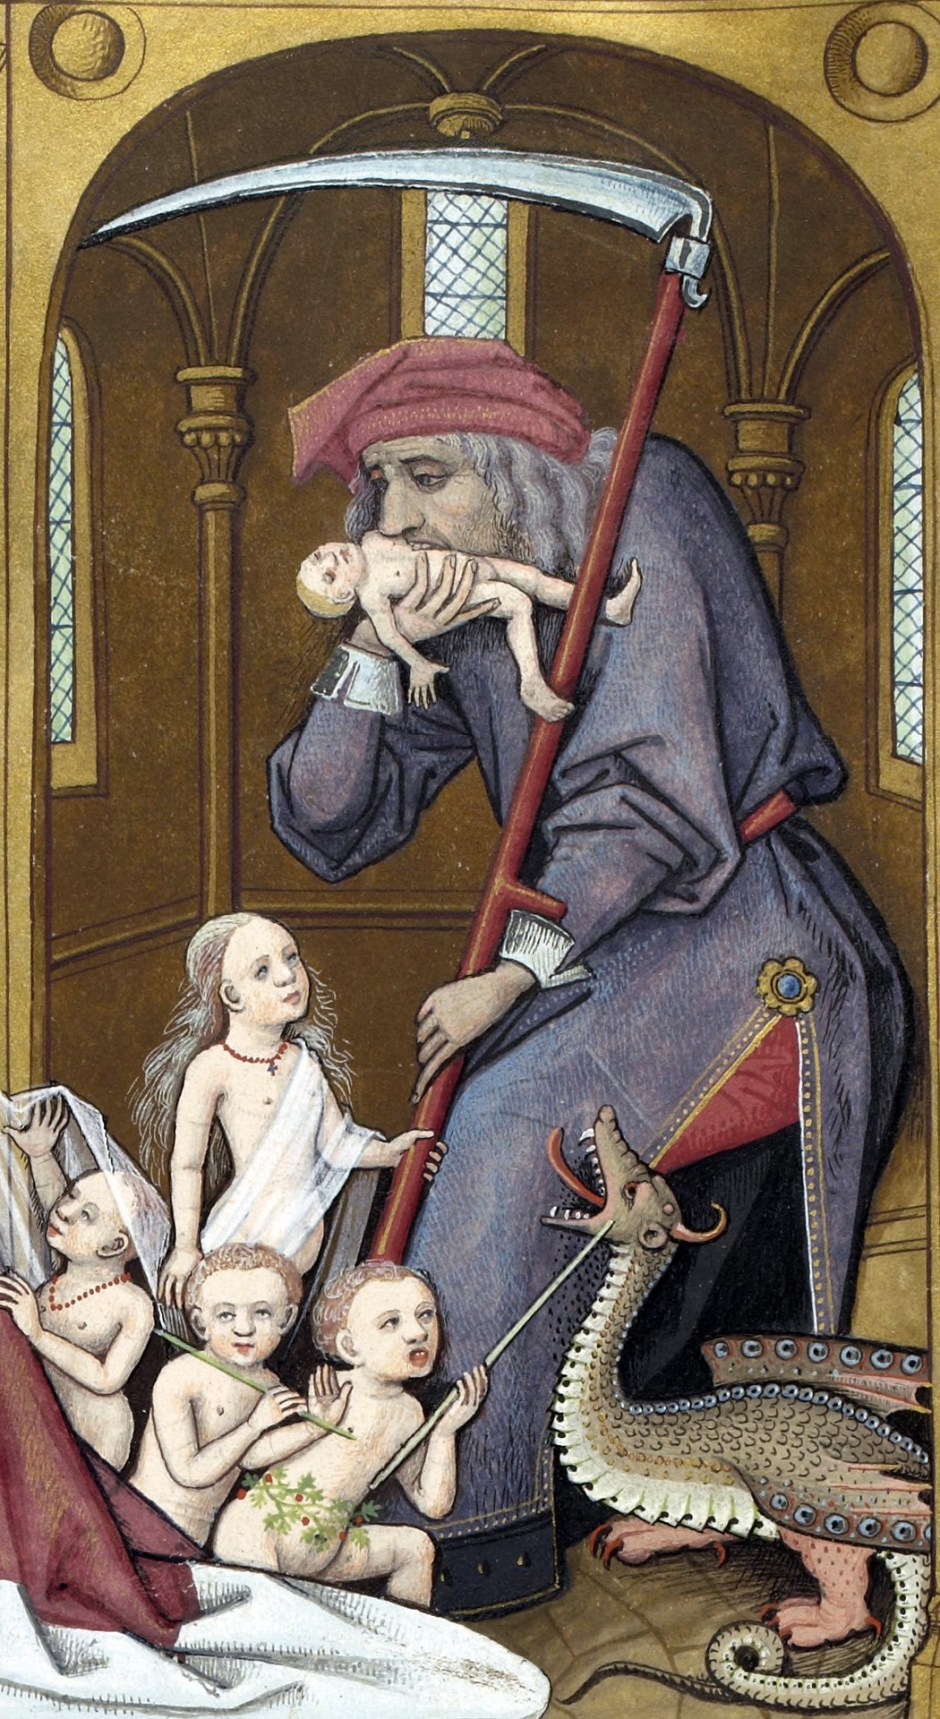 Evrart de Conty, Saturno divora i suoi figli, Biblioteca nazionale francese, Parigi